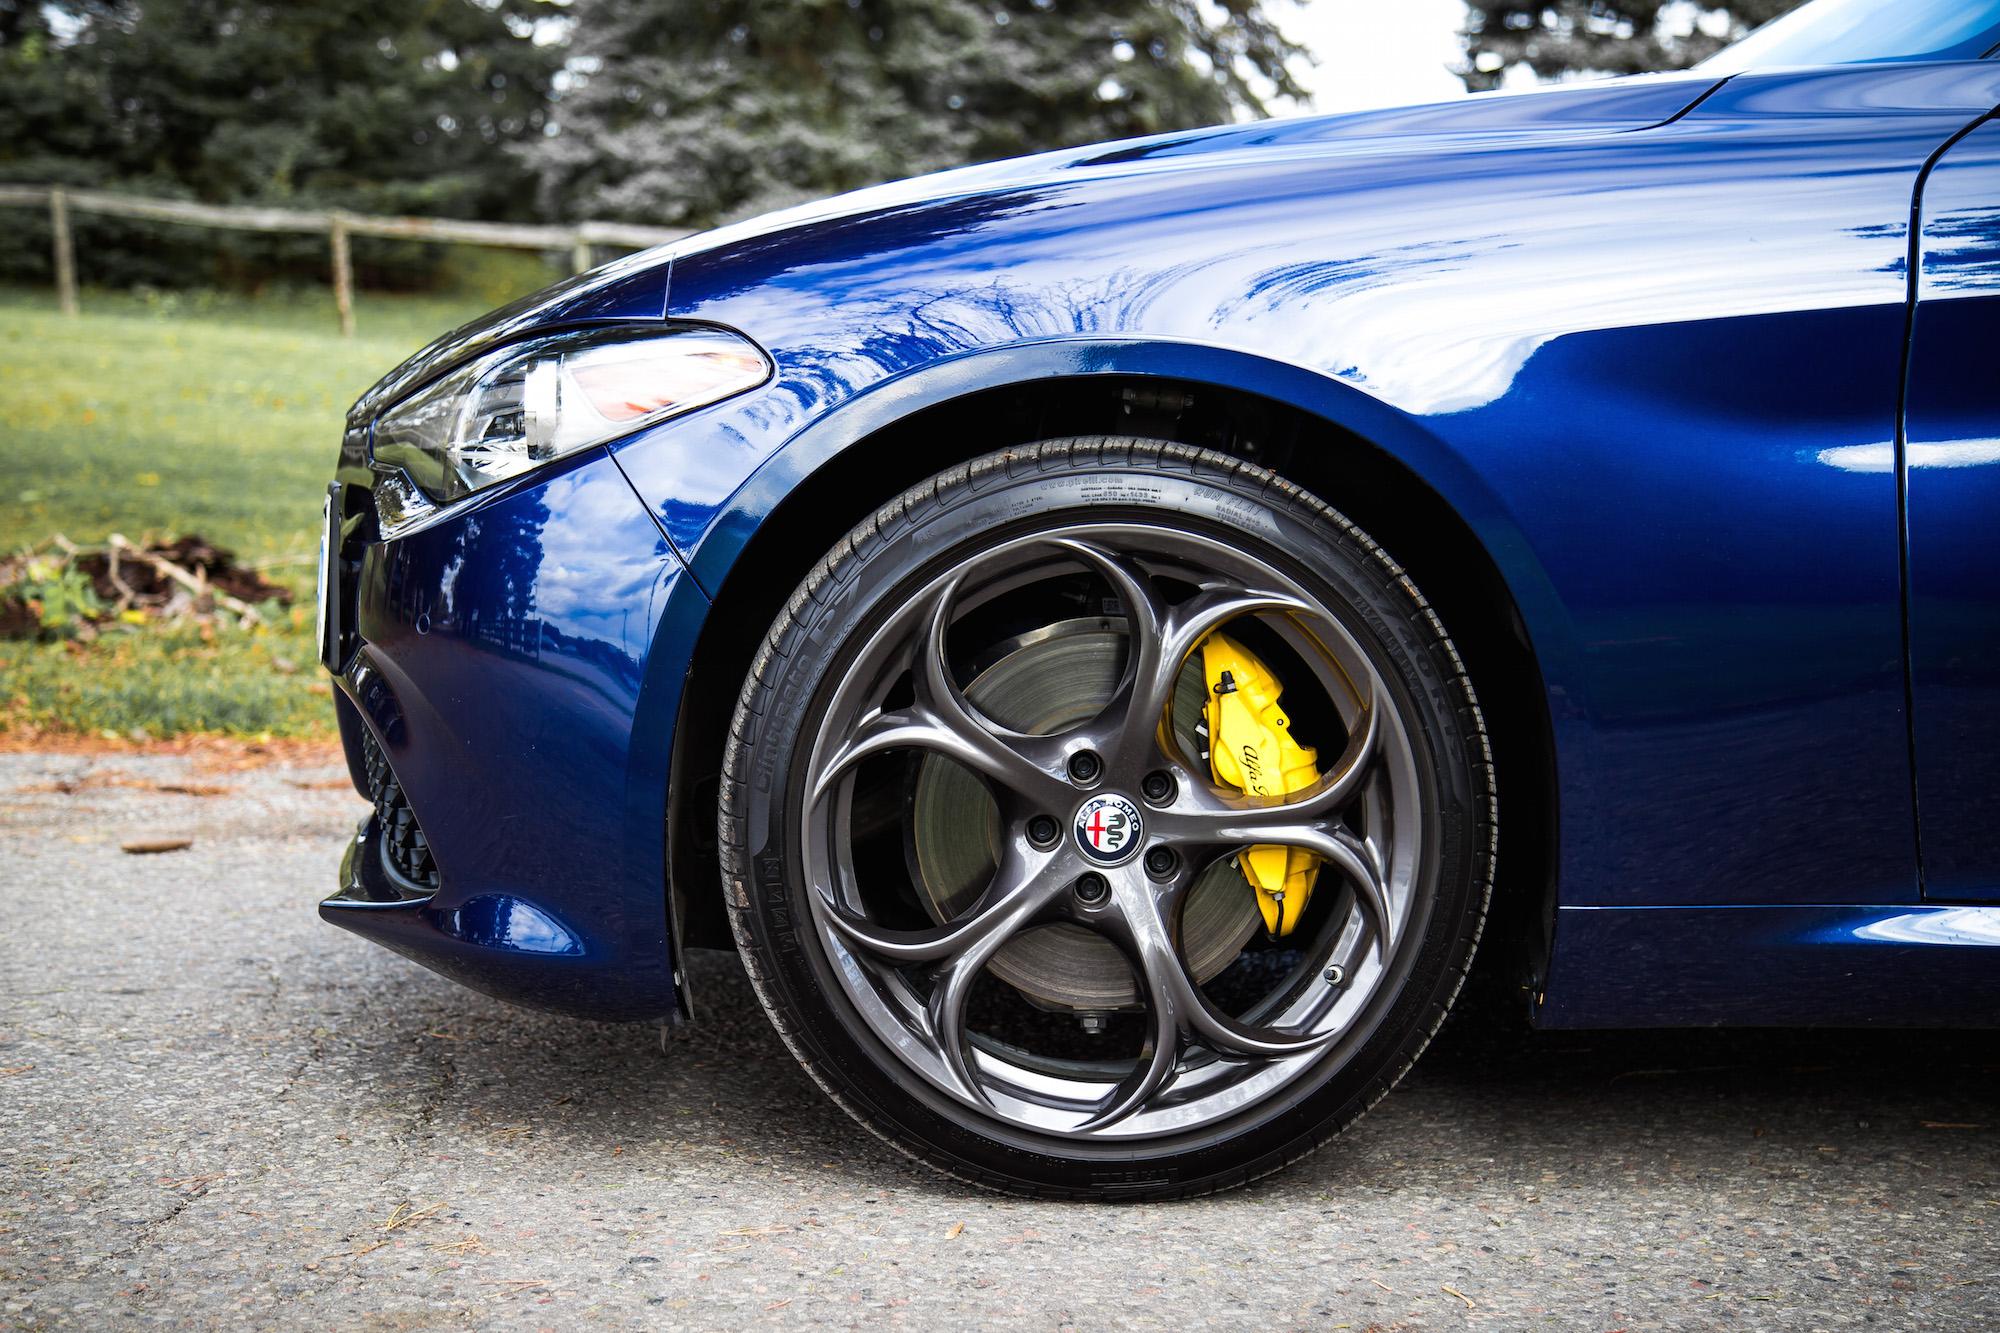 Review 2017 Alfa Romeo Giulia Ti Sport Canadian Auto Wheels 5 Ring 19 Inch Pirelli Tires